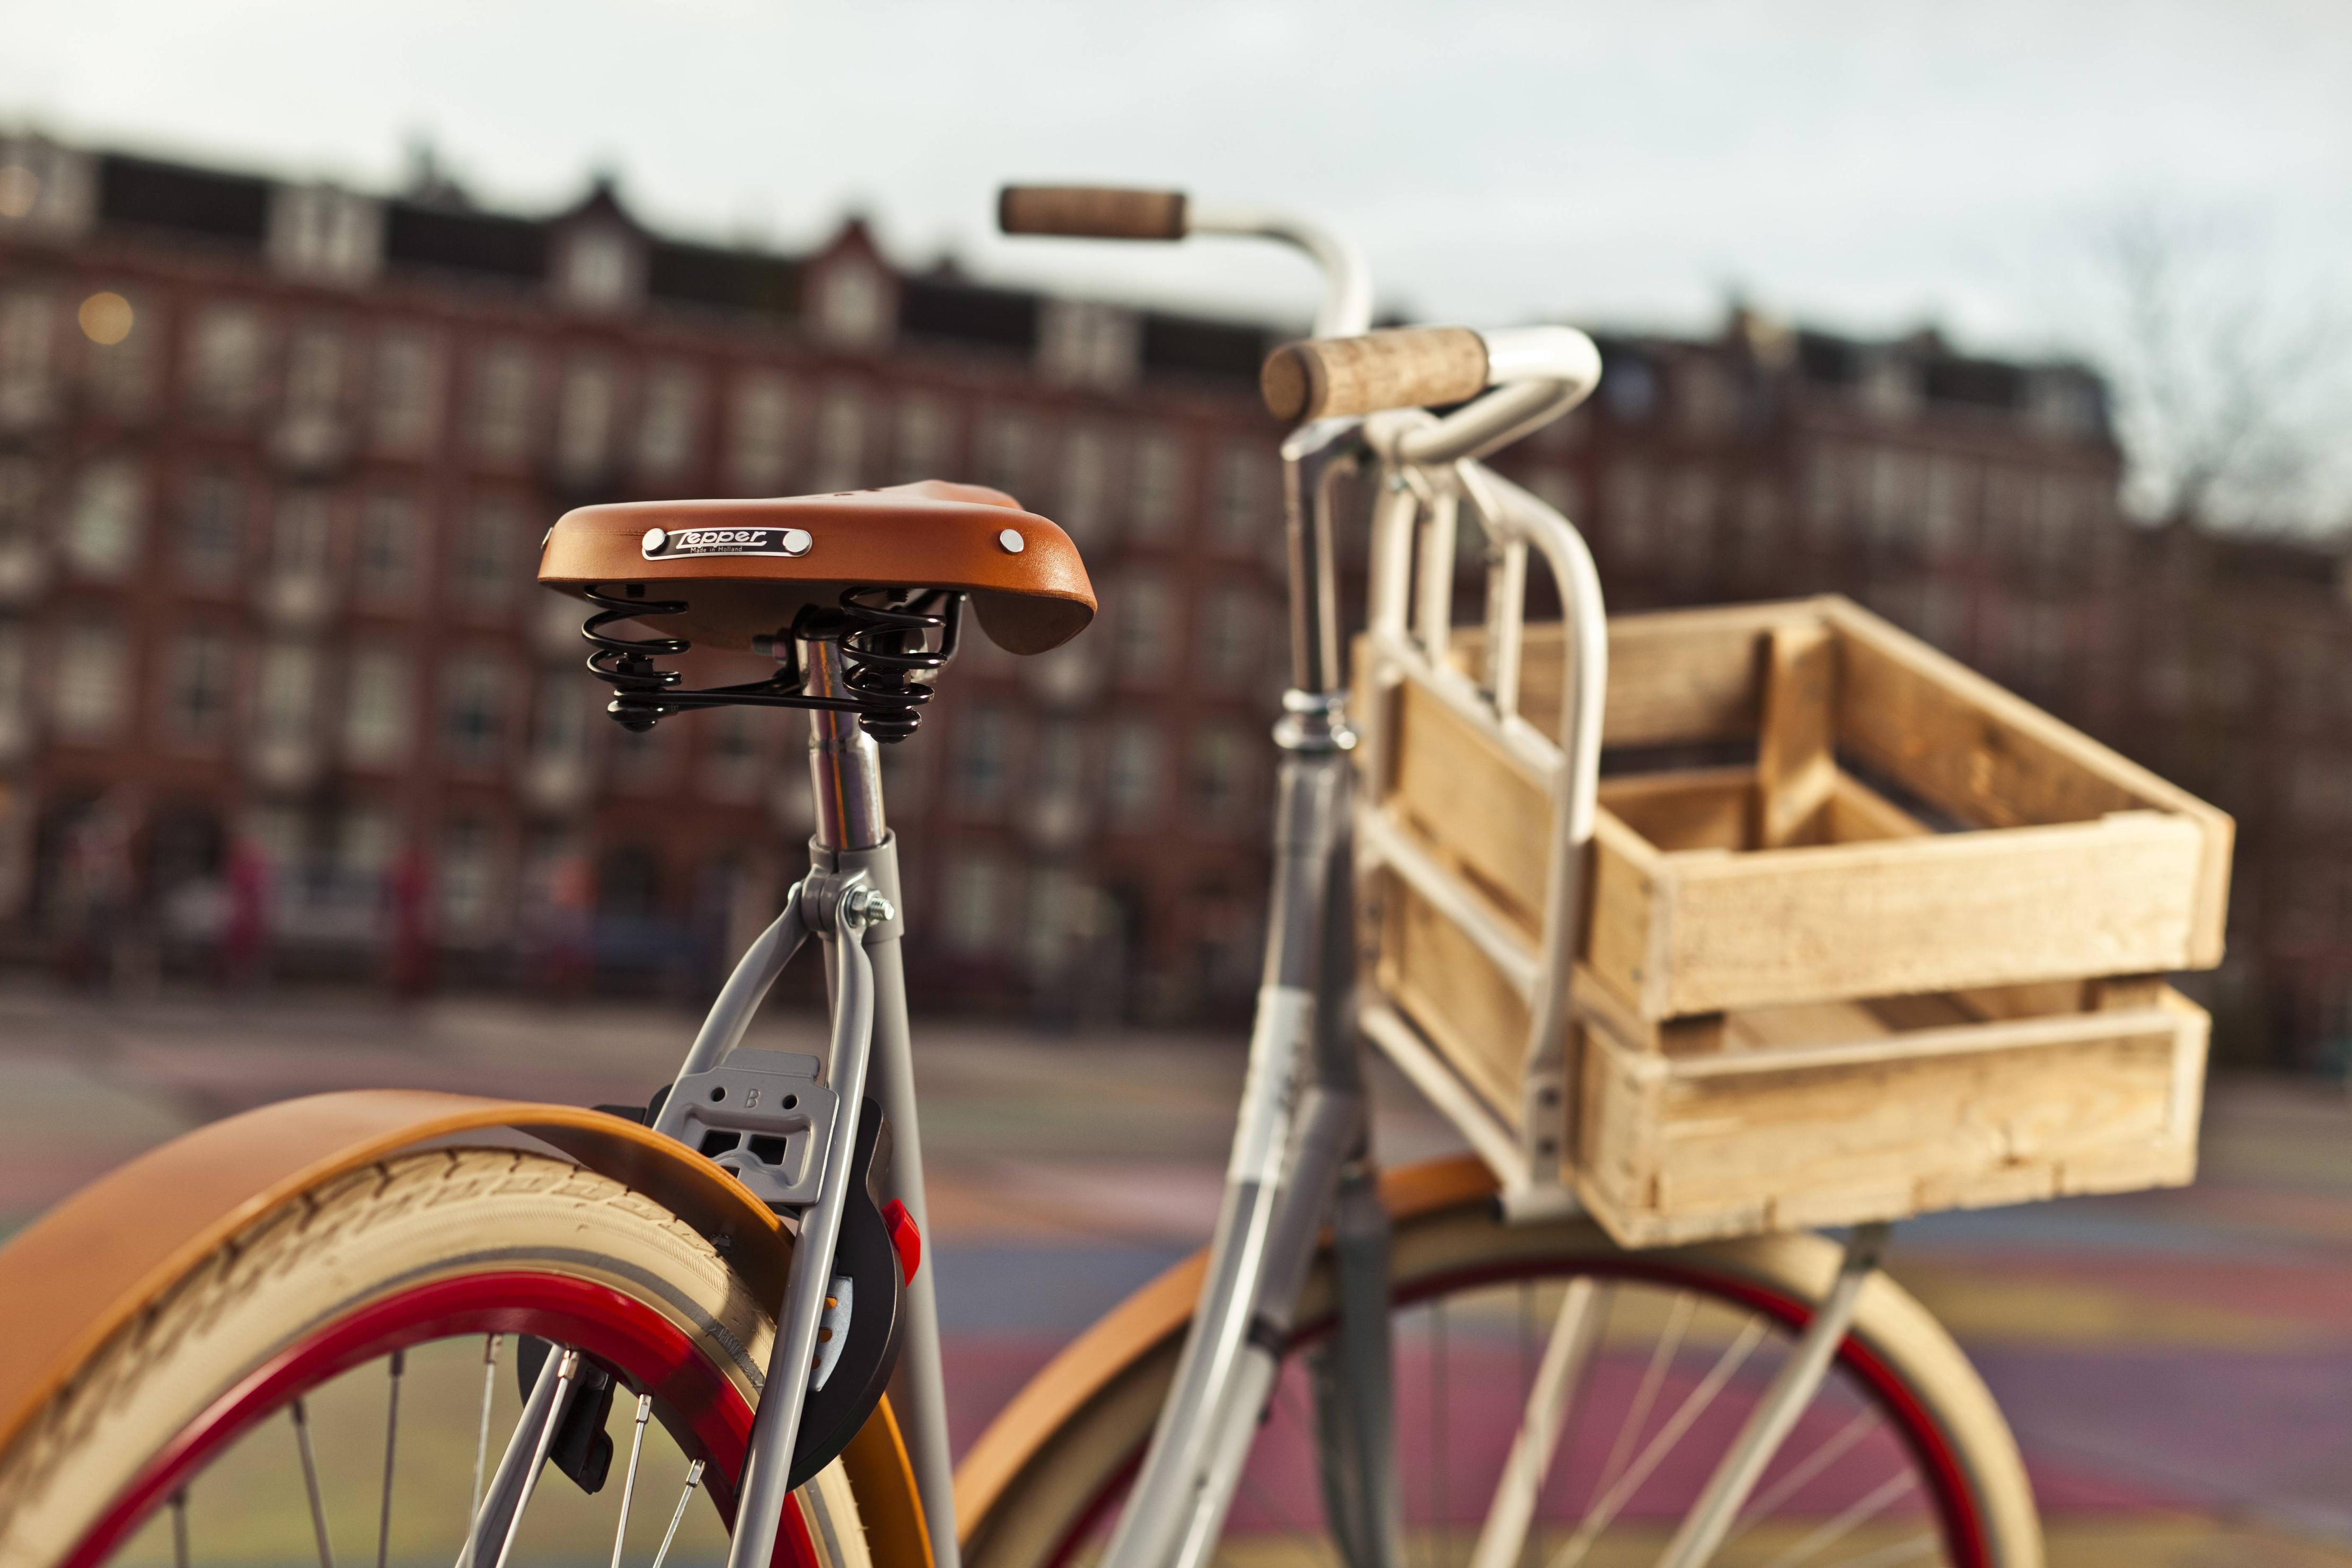 Bicicleta Holandesa Fuente: biciclasica.wordpress.com